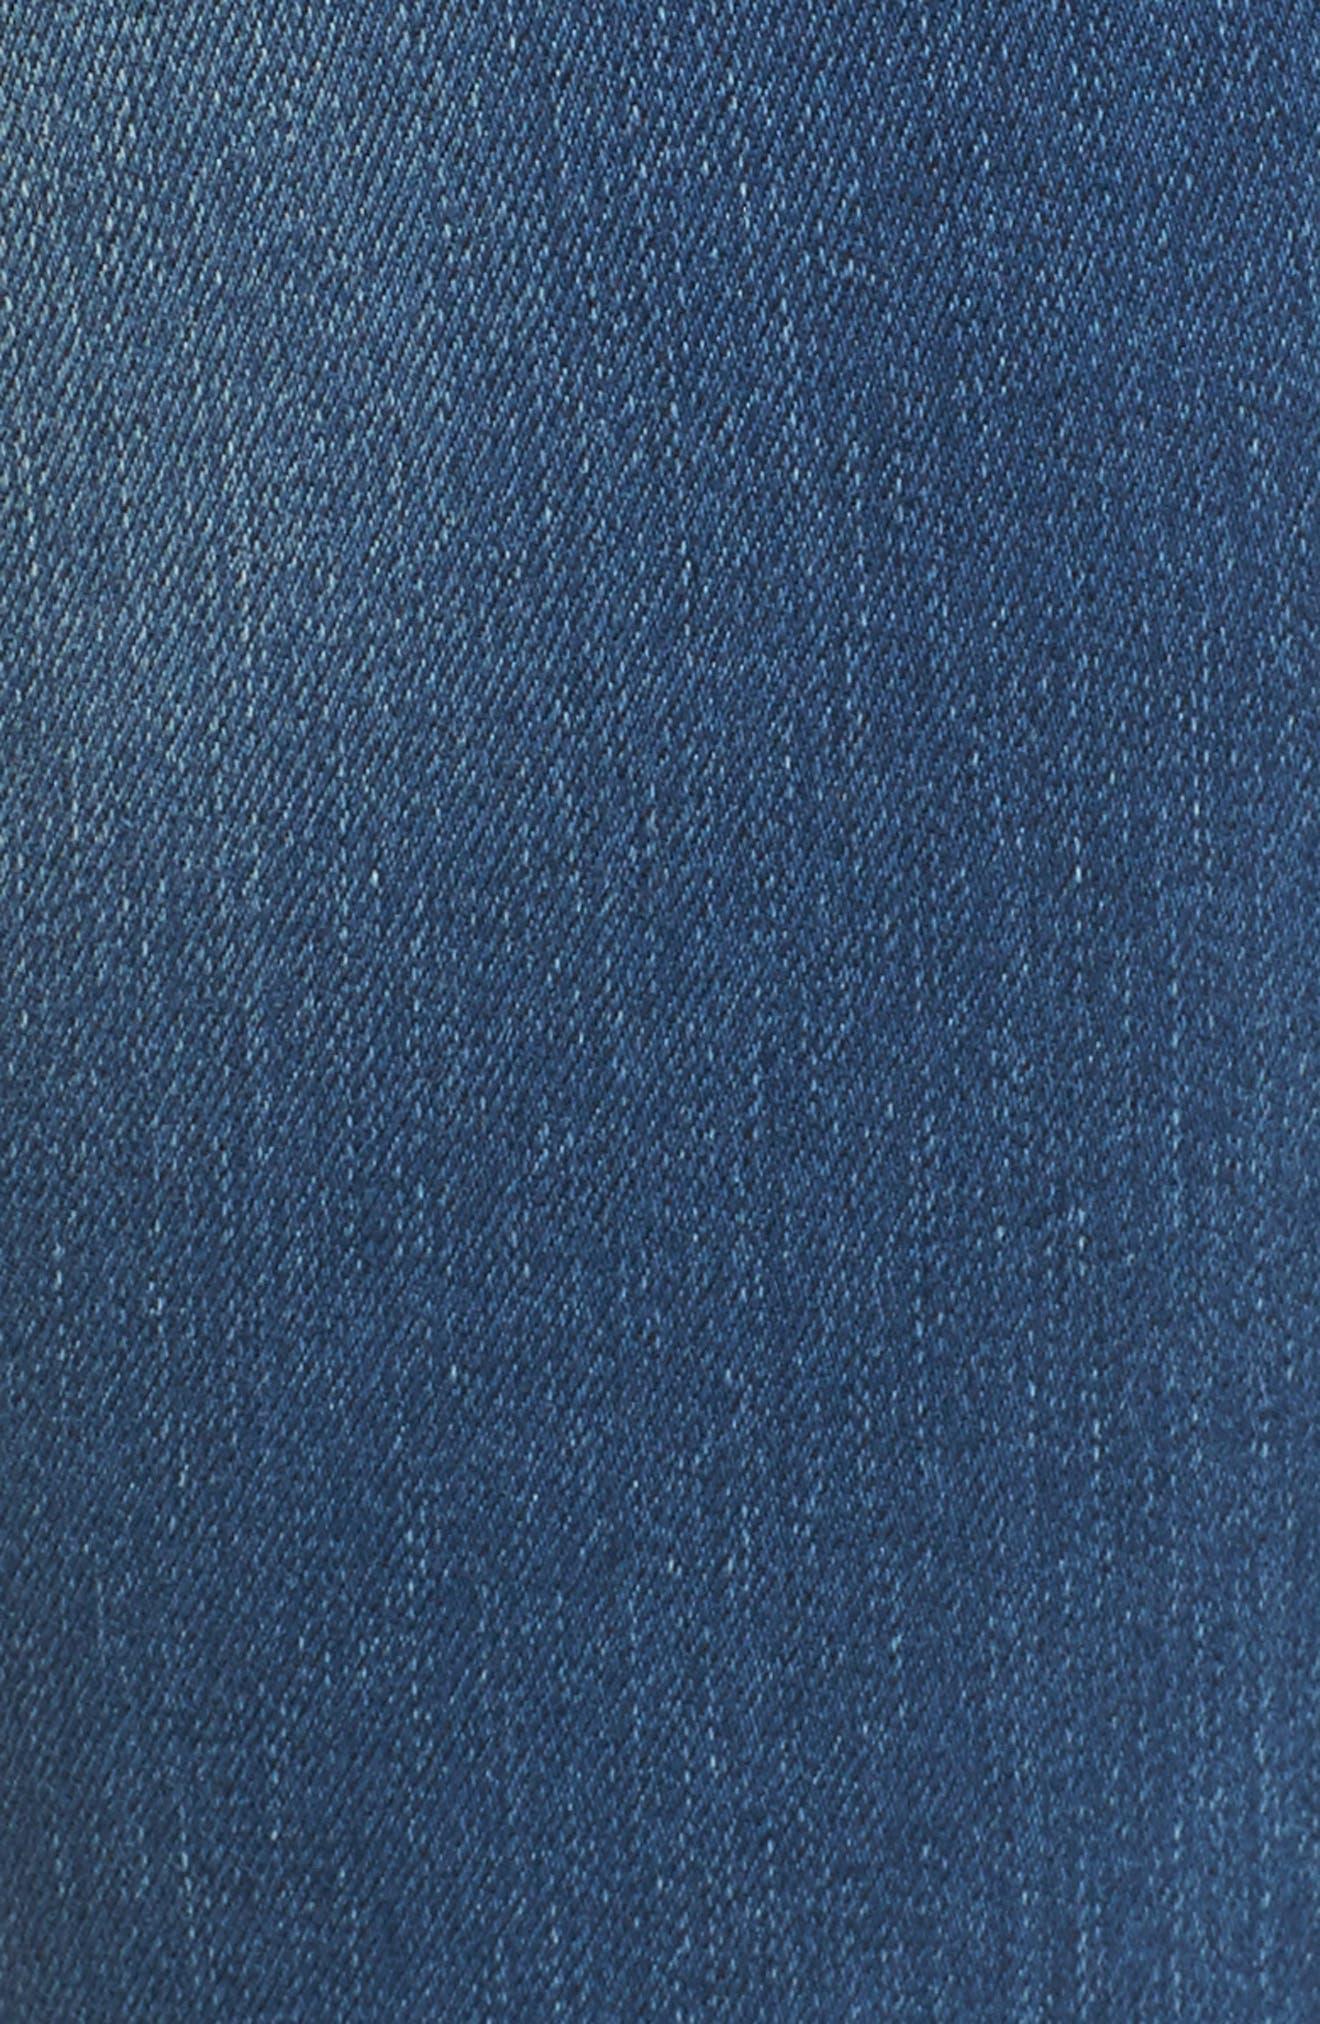 Stella Low Rise Skinny Jeans,                             Alternate thumbnail 5, color,                             400